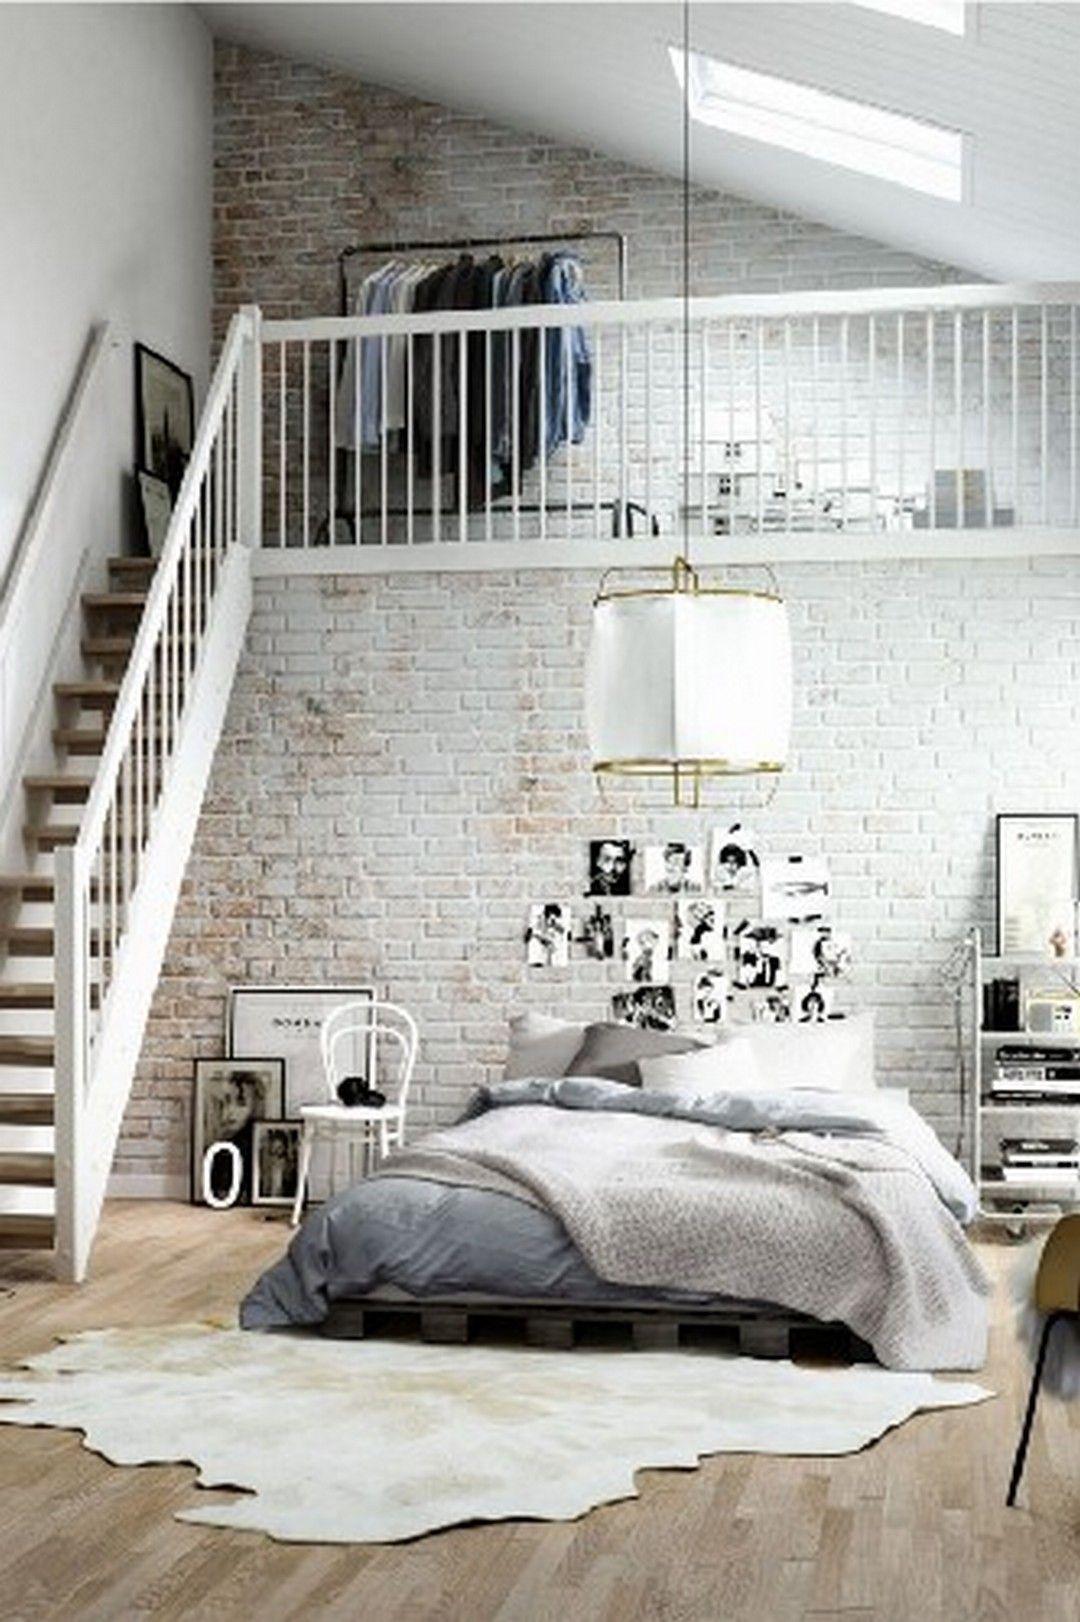 20 Modern and Stylish Rustic Scandinavian Bedroom Decor | Bedroom ...